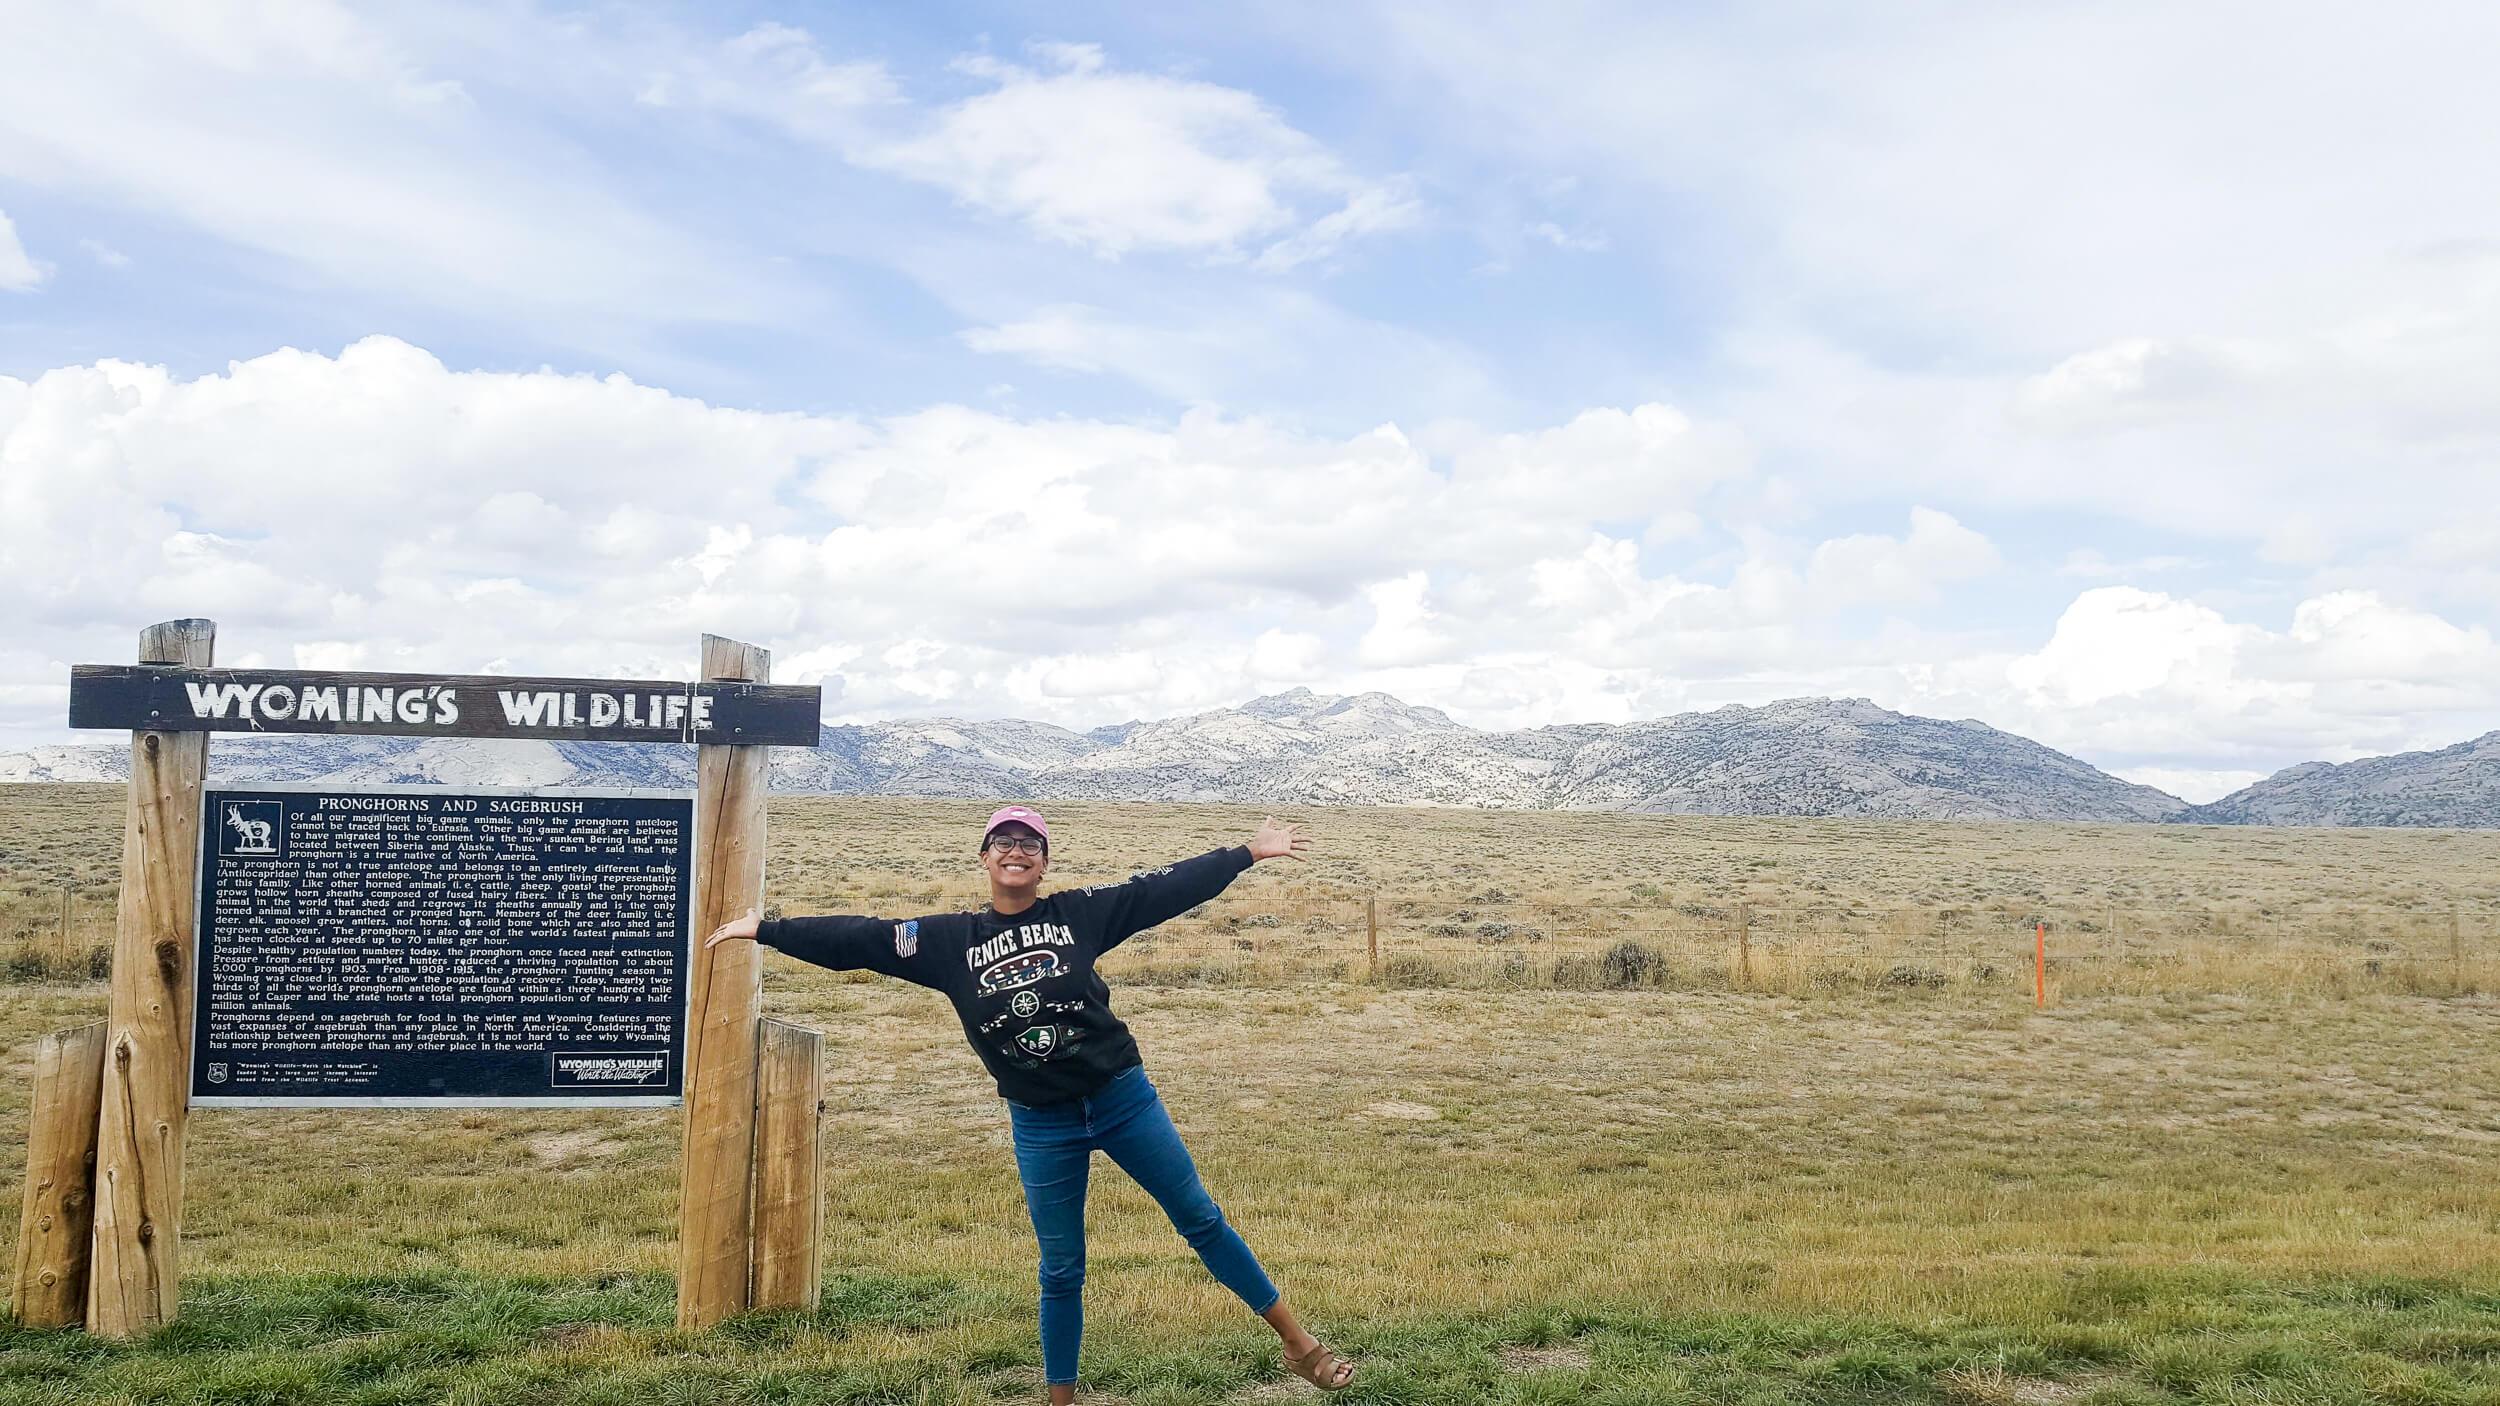 Wyoming, United States